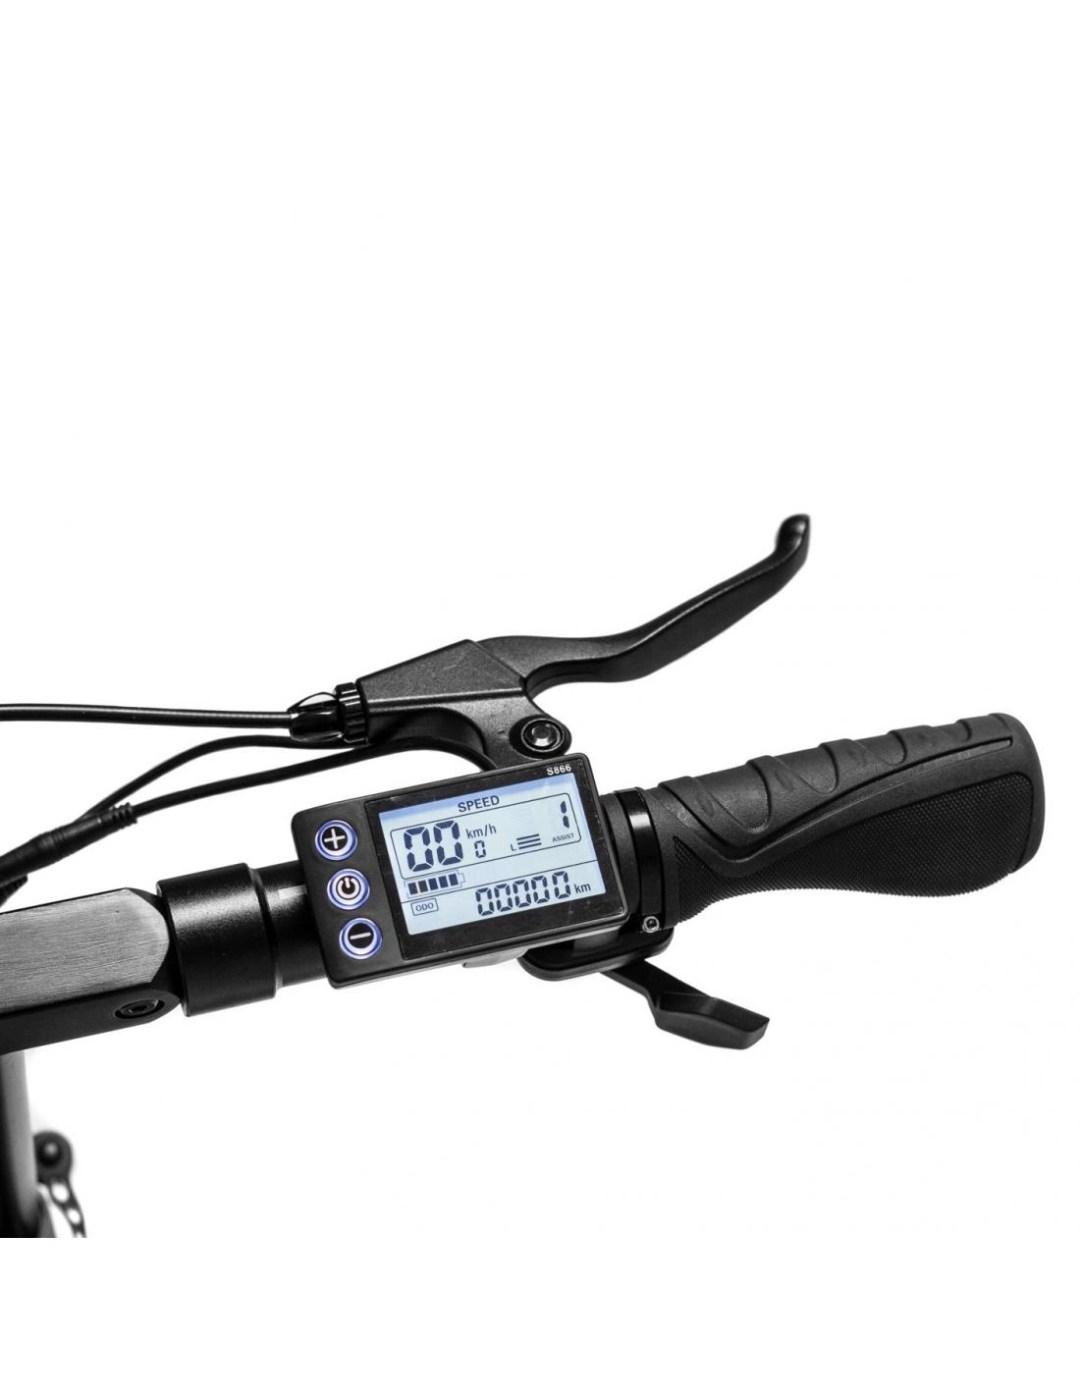 Cuentakilometros smartgyro speedway v20